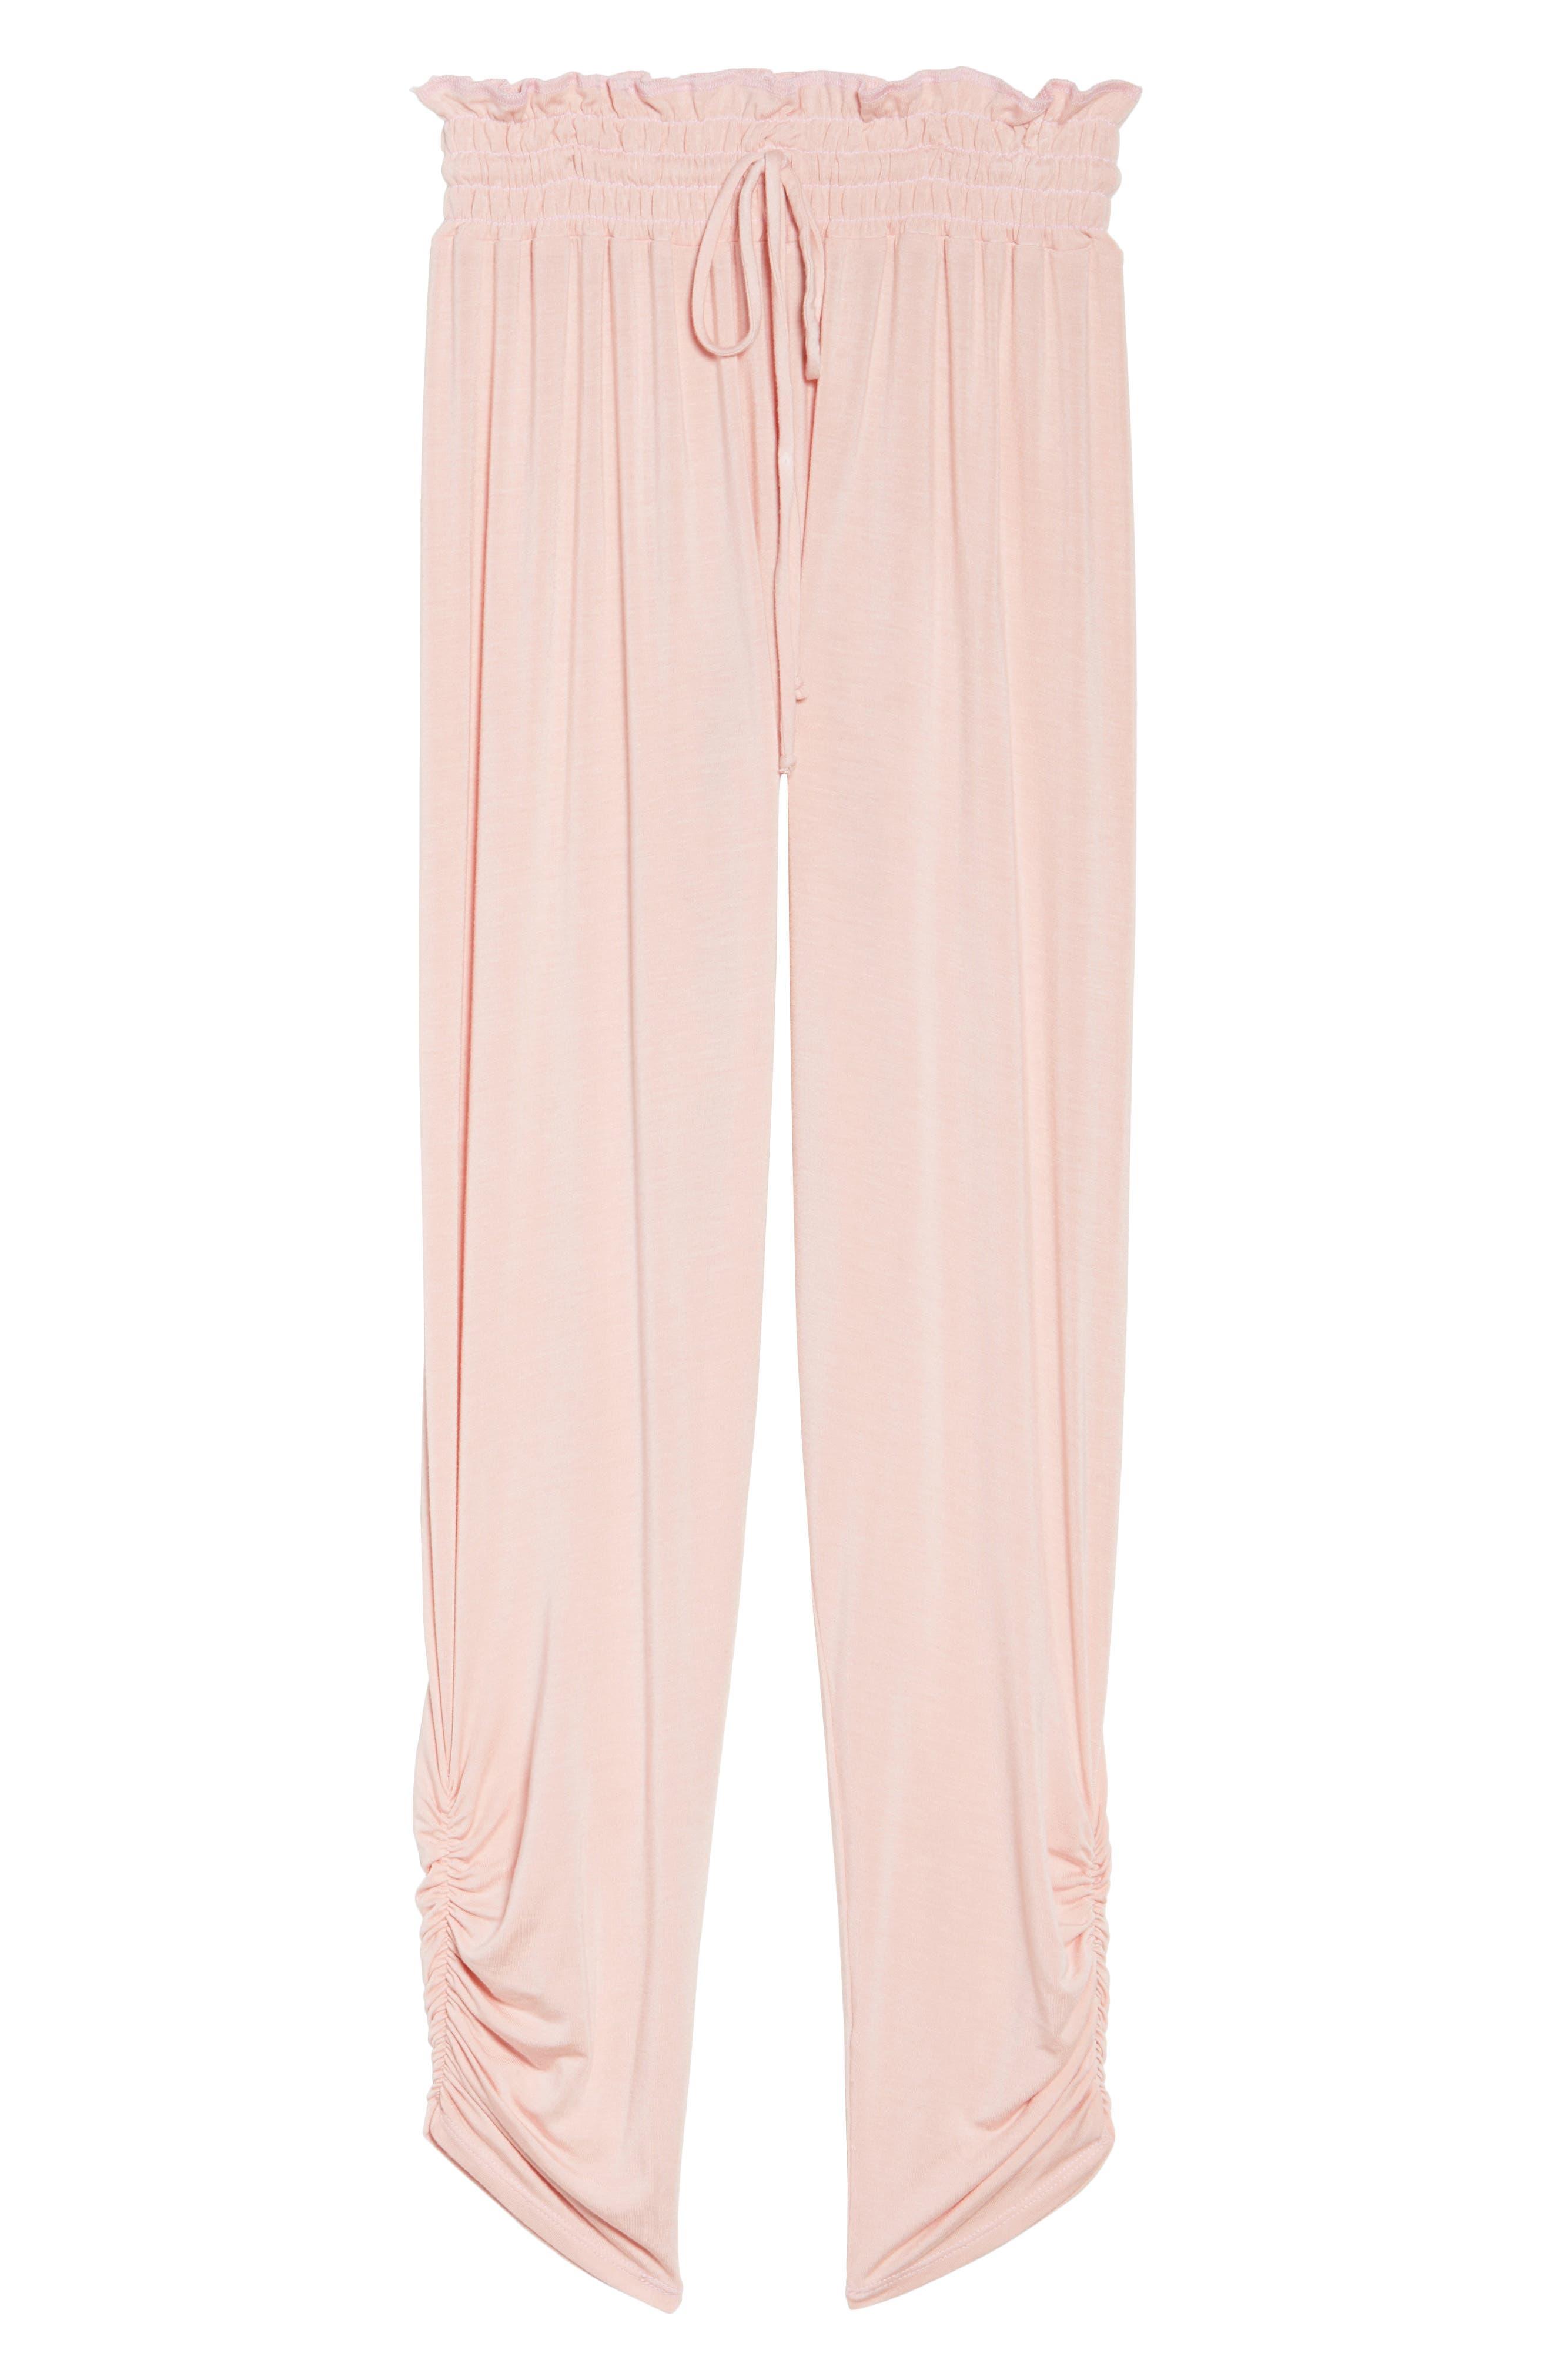 Bella Pants,                             Alternate thumbnail 4, color,                             Dream Pink